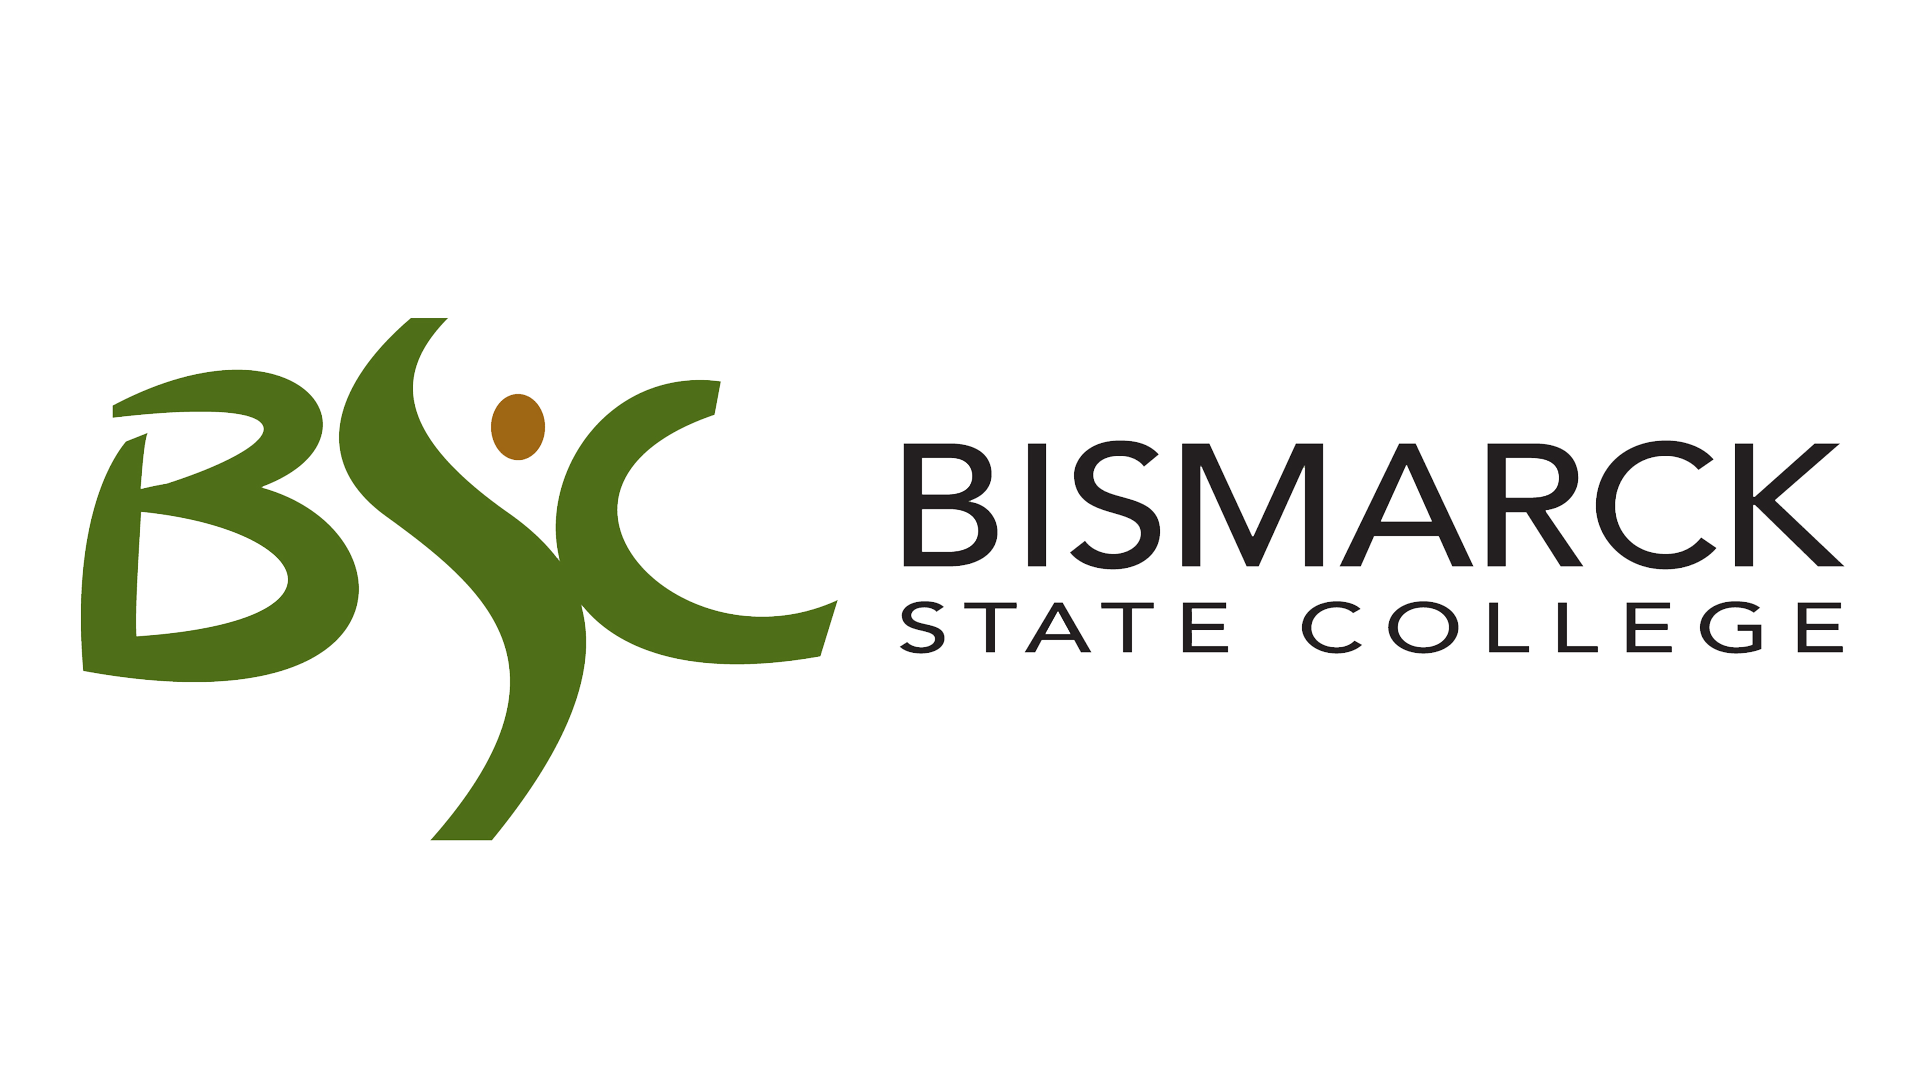 1179 Bismarck State College_1534852297275.png.jpg